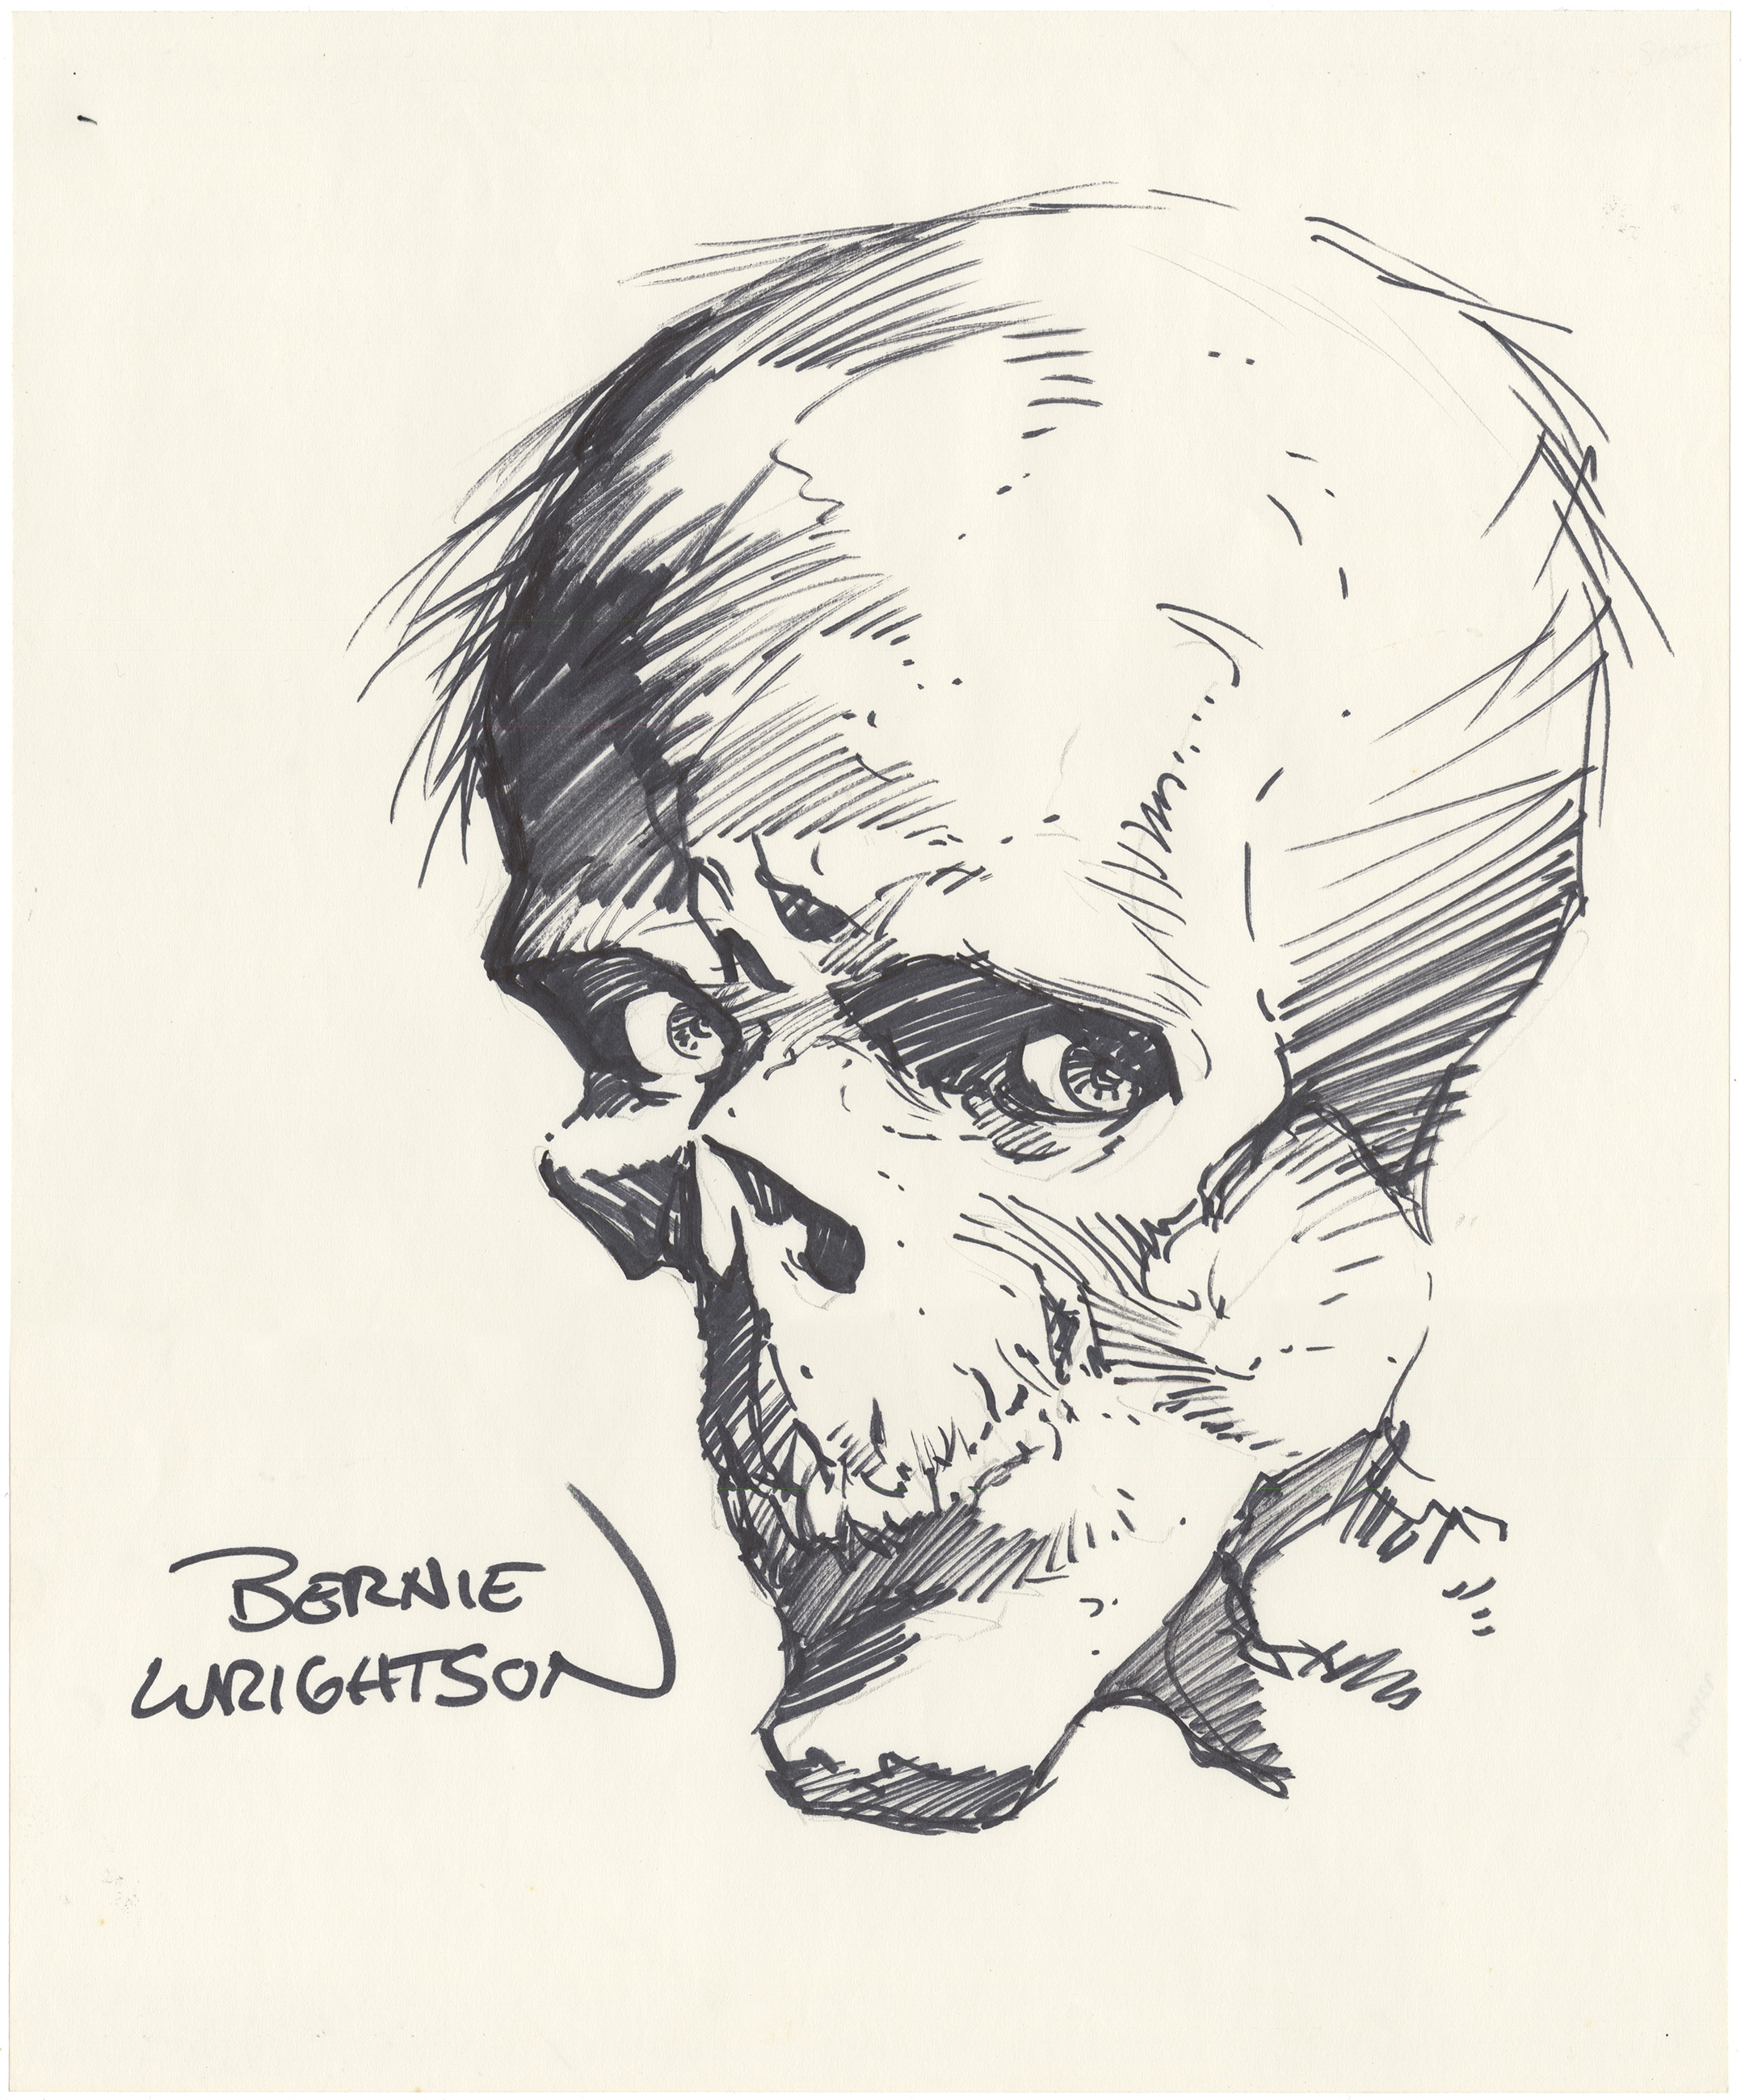 Bernie Wrightson Skull Sketch